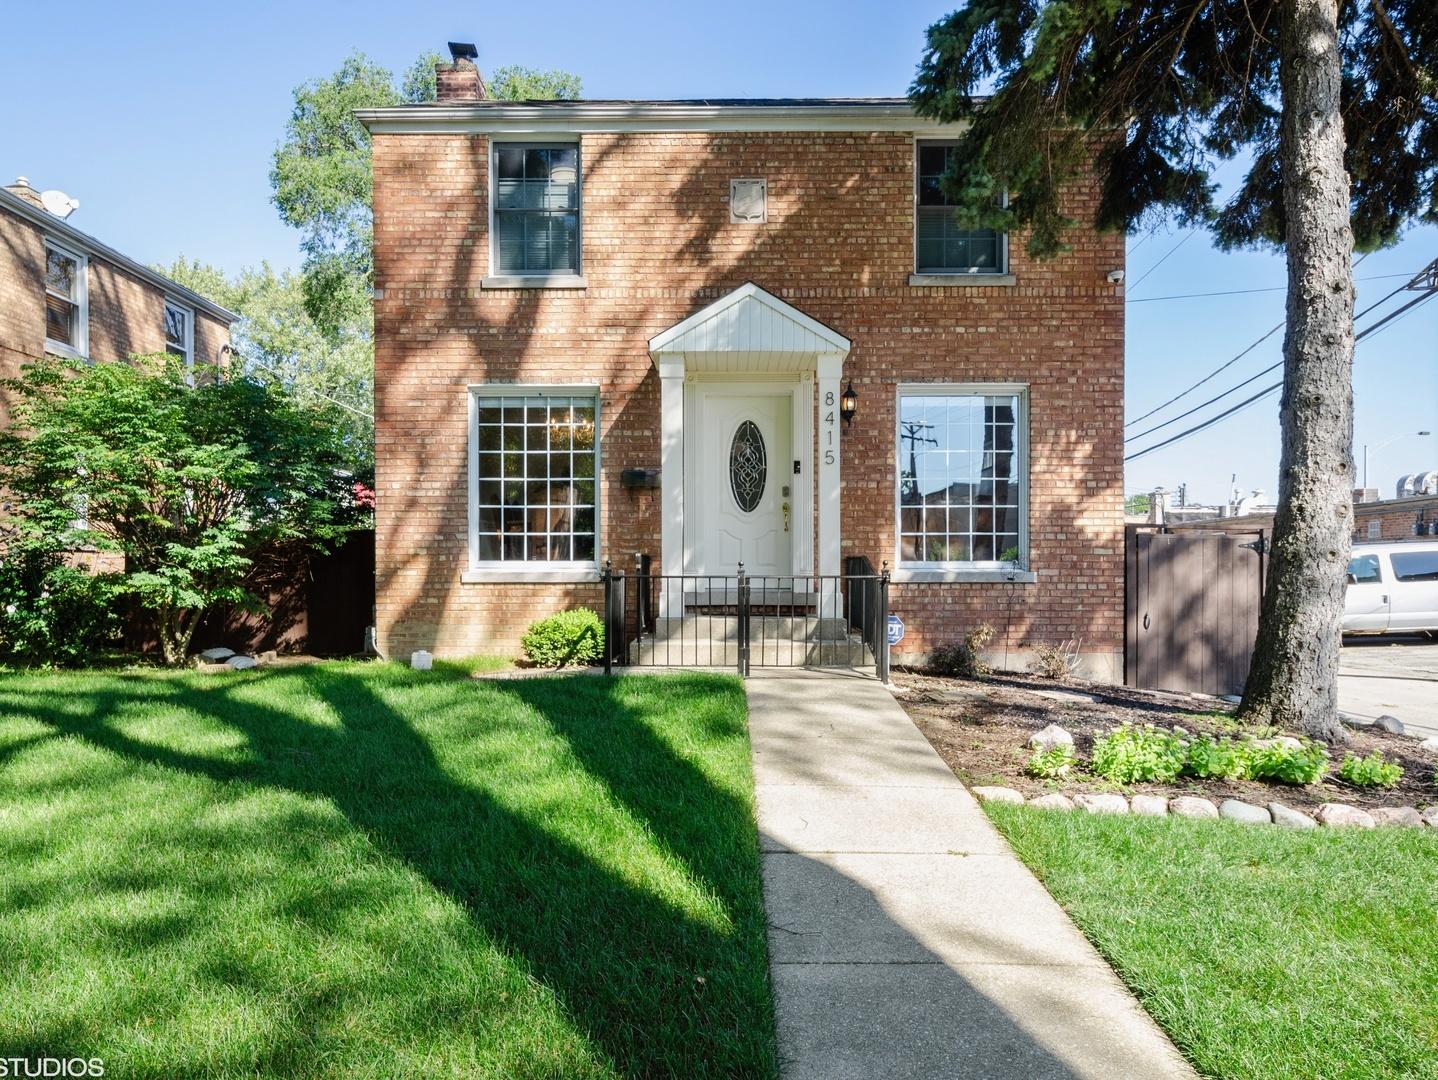 8415 Keystone Avenue, one of homes for sale in Skokie